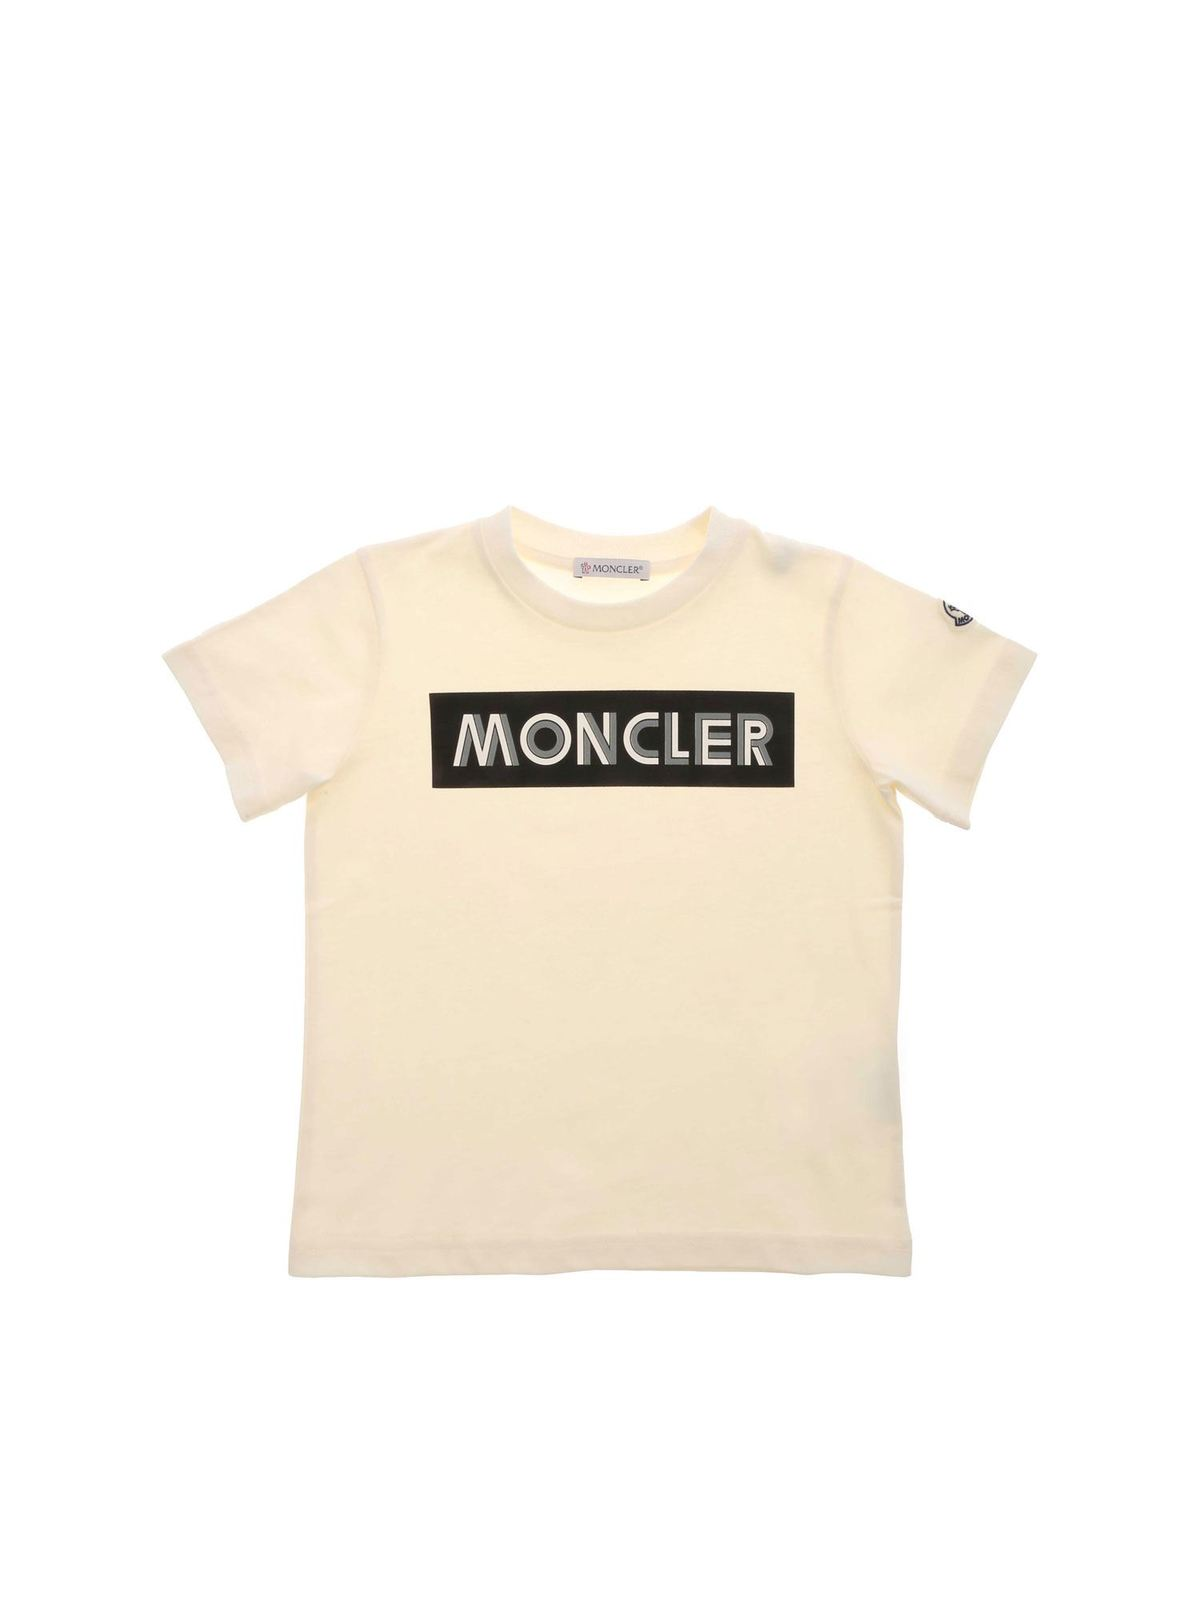 Moncler Jr Cottons LOGO PRINT T-SHIRT IN IVORY COLOR